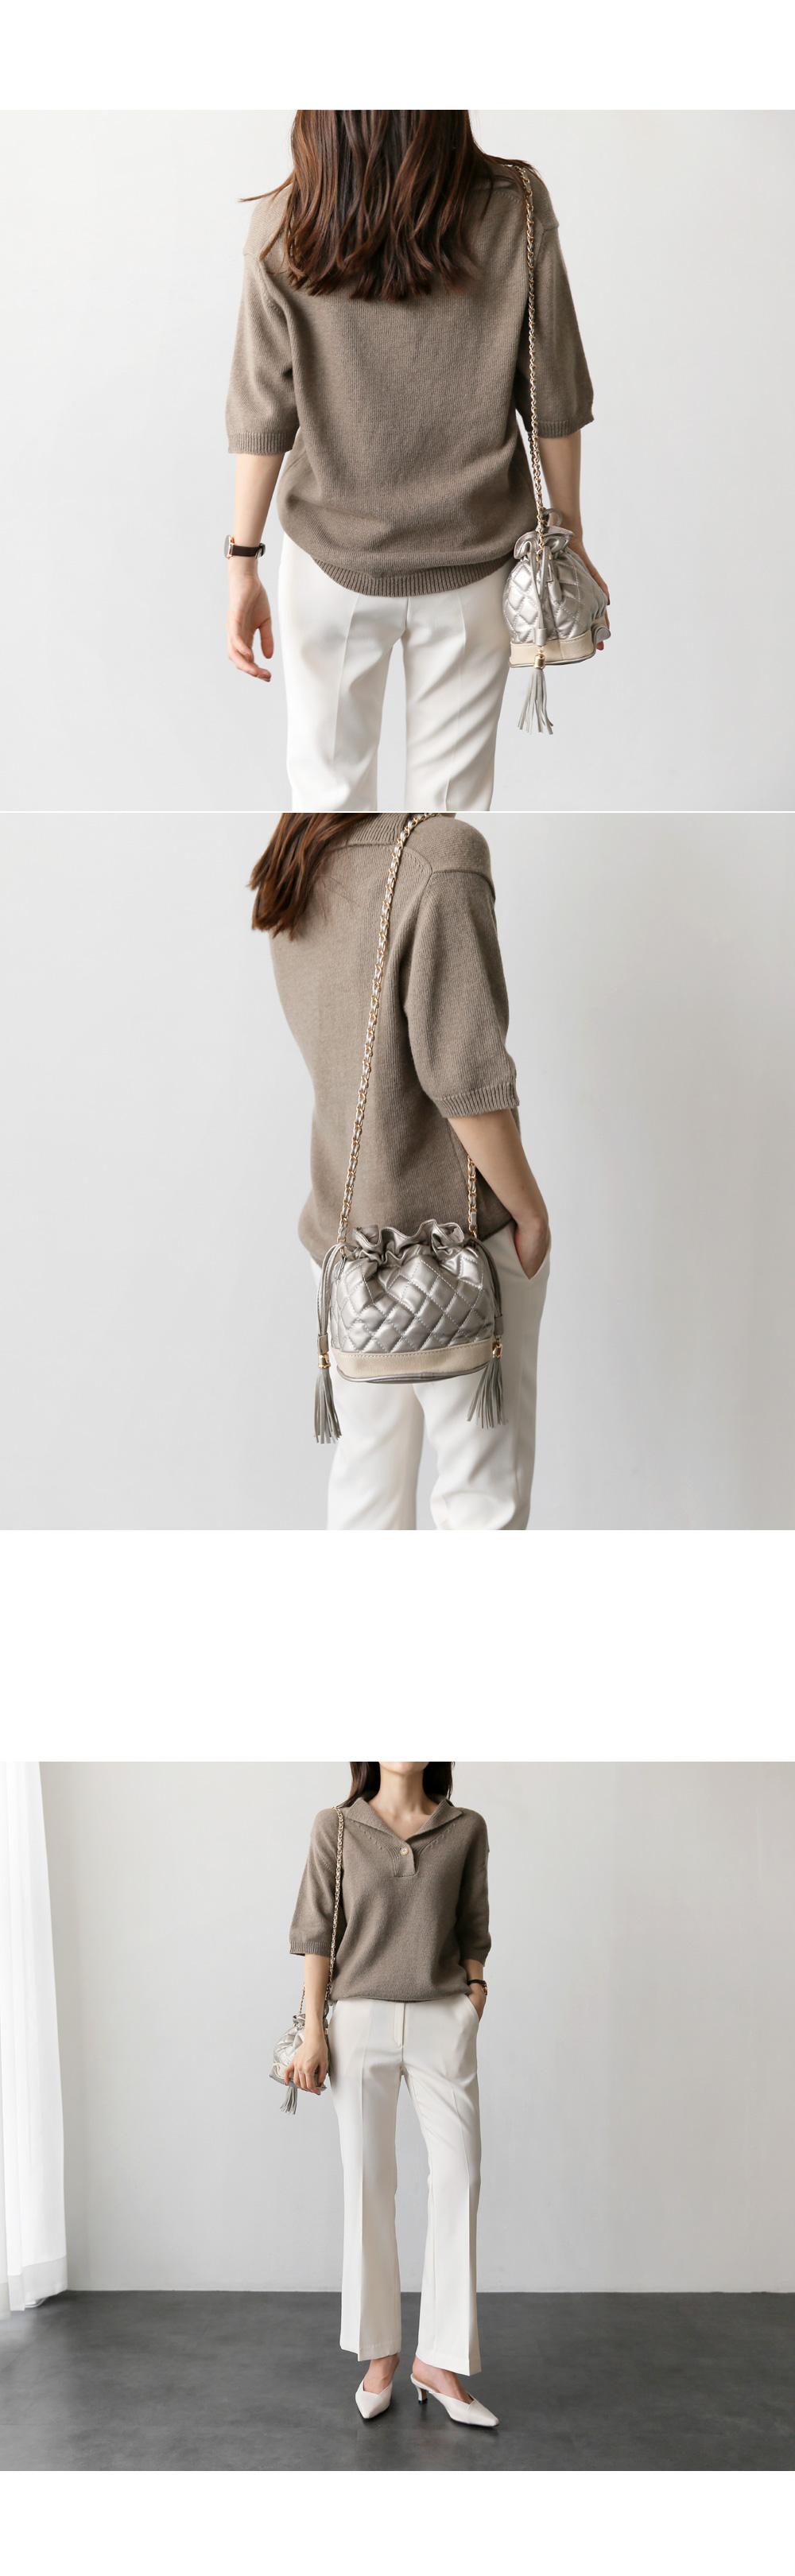 Pke knit